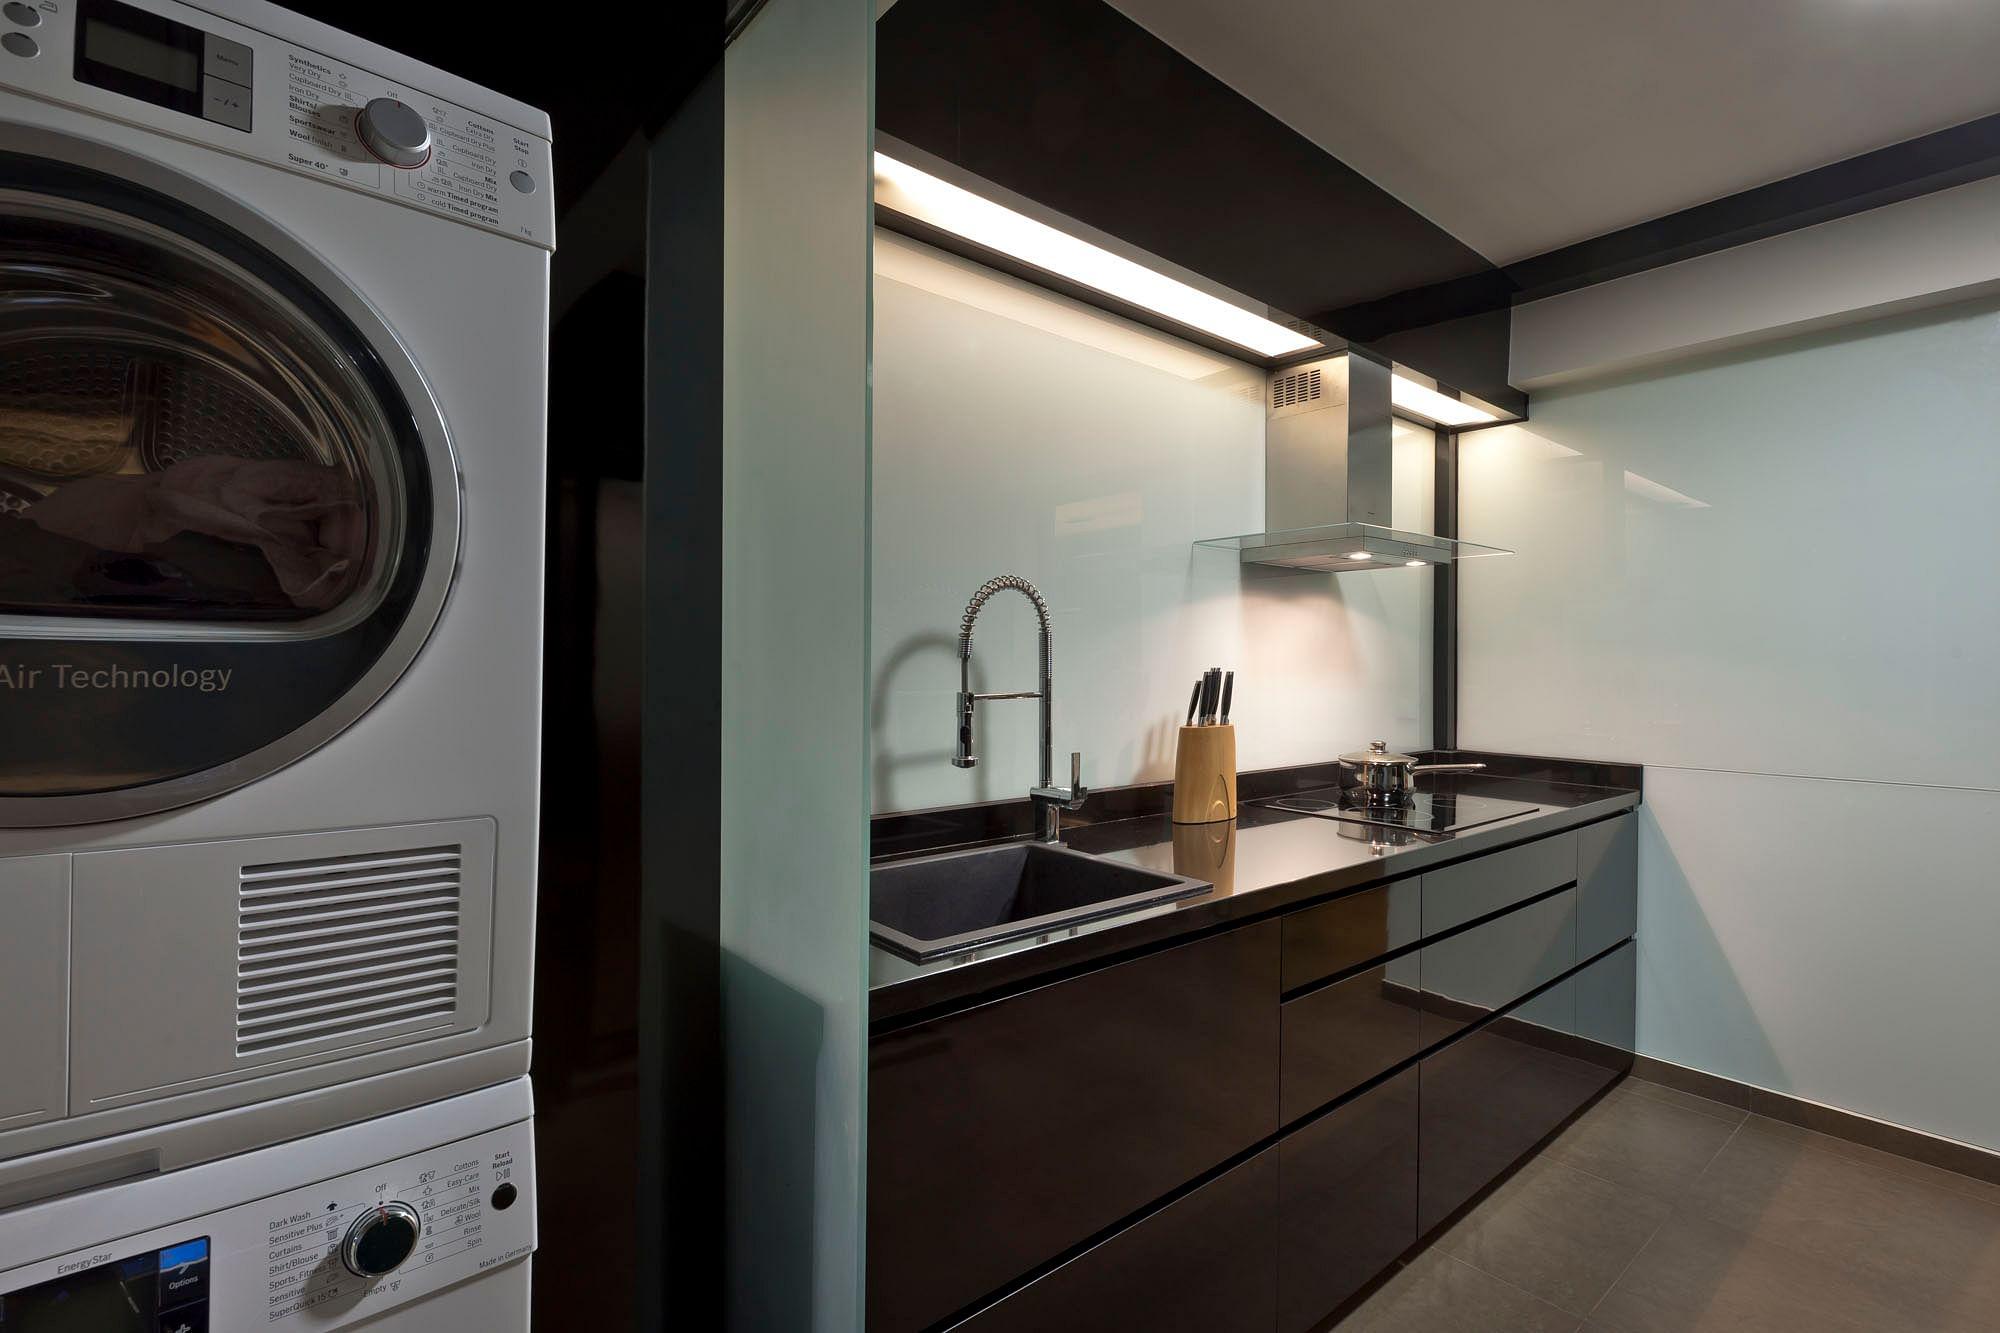 100 Hdb Home Decor Design Xiaxue Blogspot Com